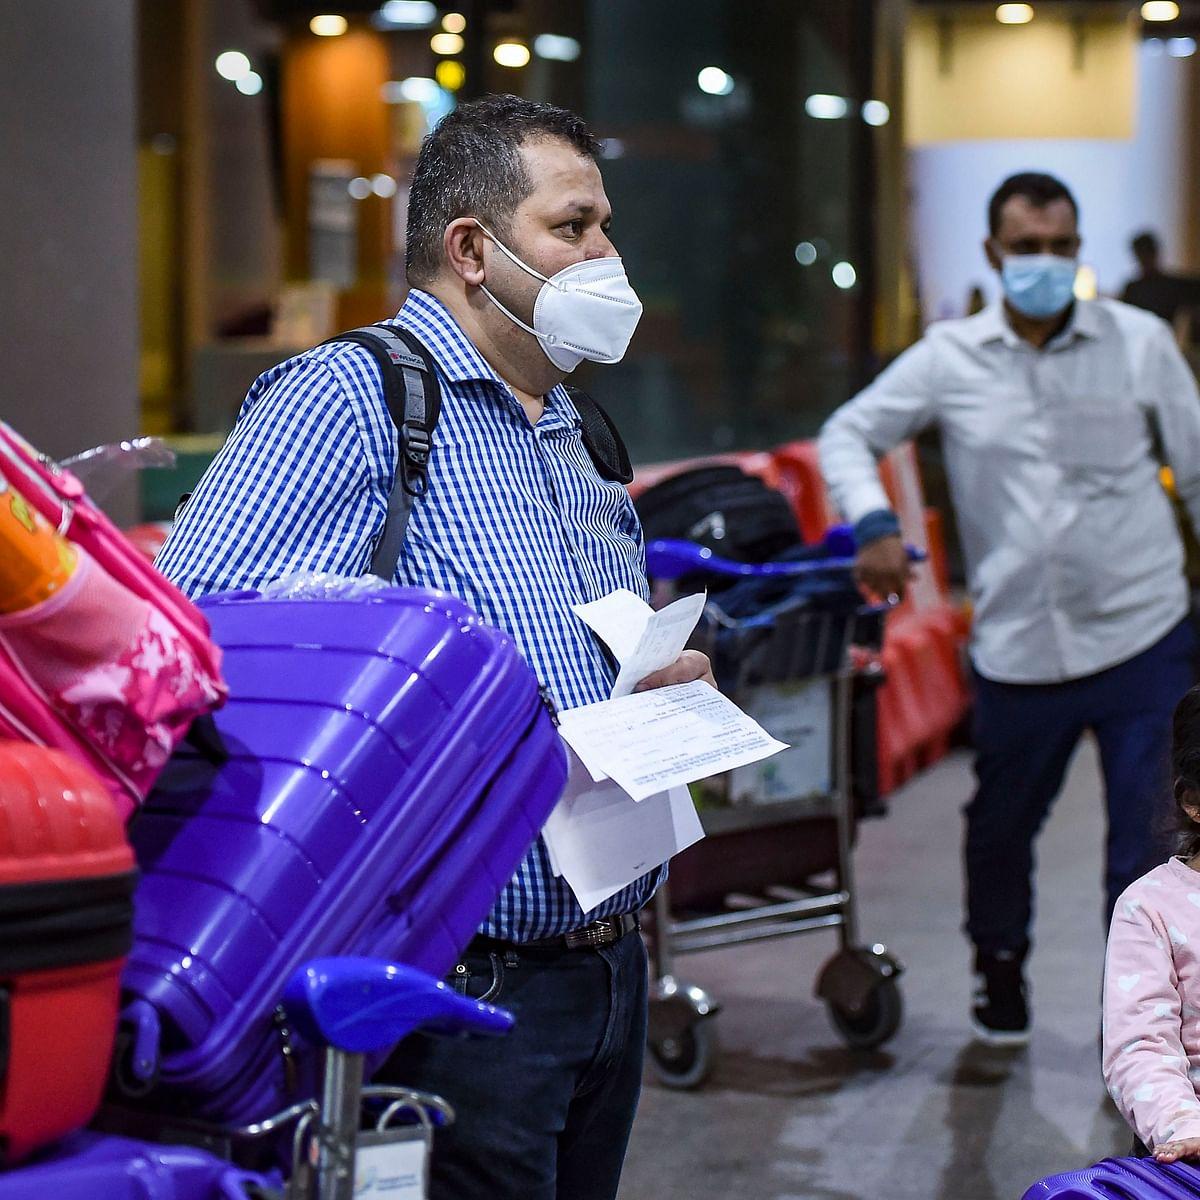 Mumbai COVID-19 surge: BMC exempts vaccinated international returnees from compulsory institutional quarantine